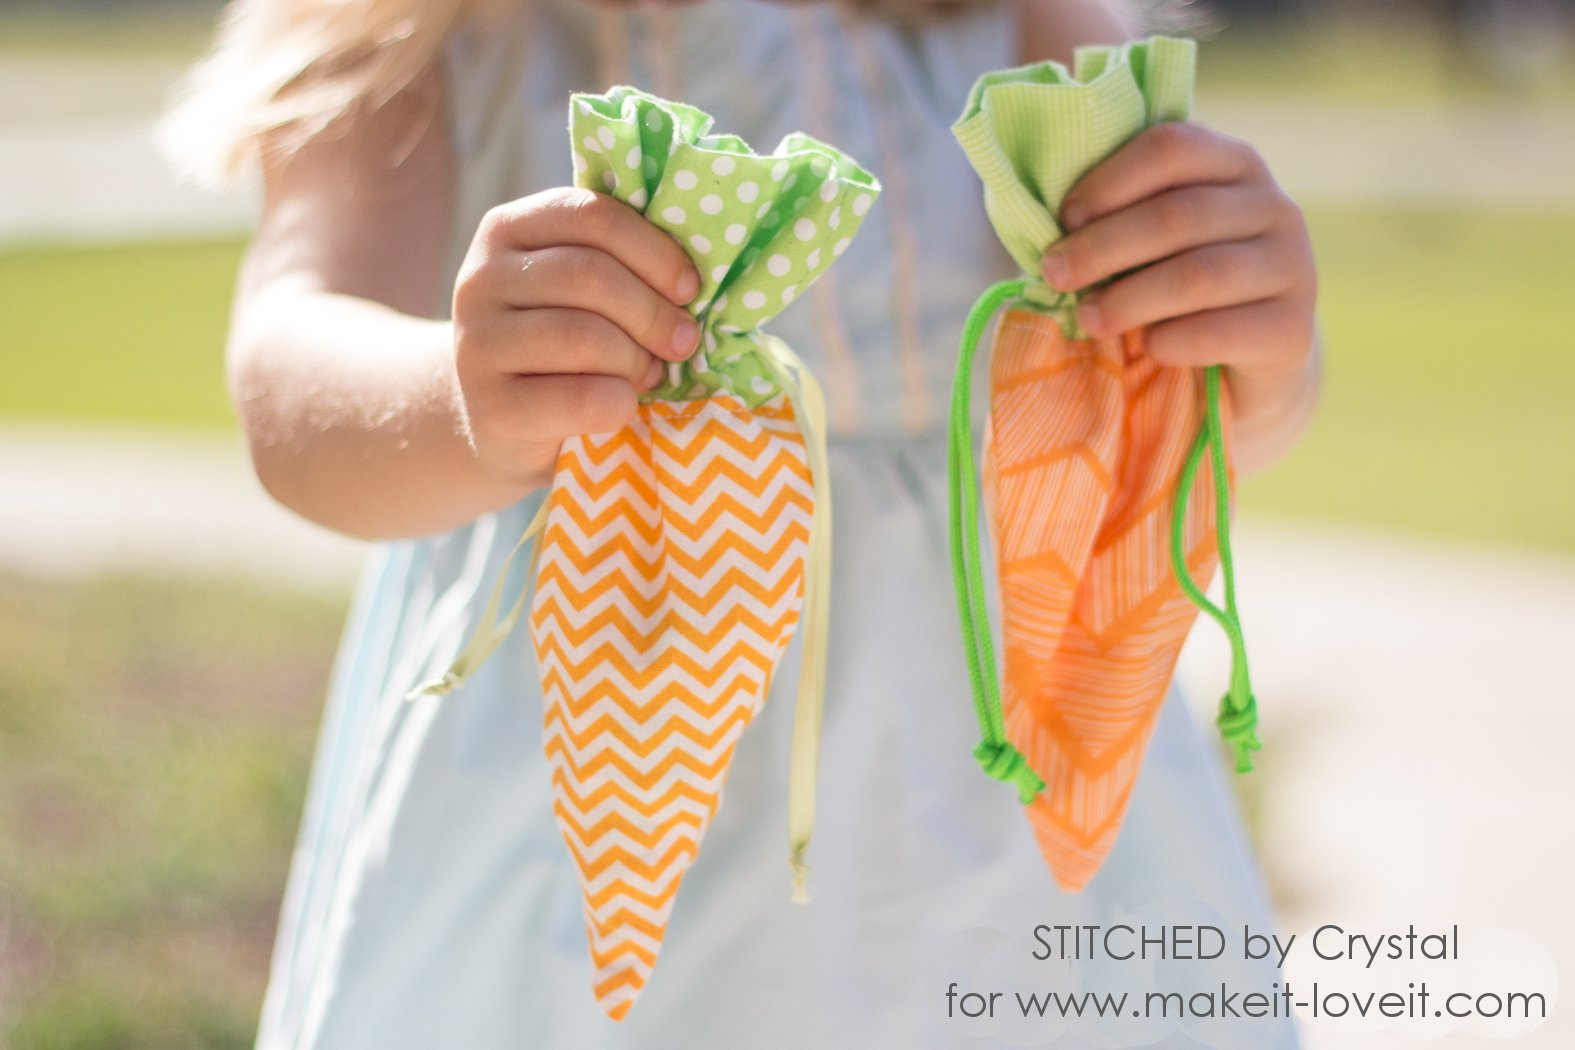 Sew a DIY Carrot Treat Bag for Easter! | via www.ashley1.mystagingwebsite.com